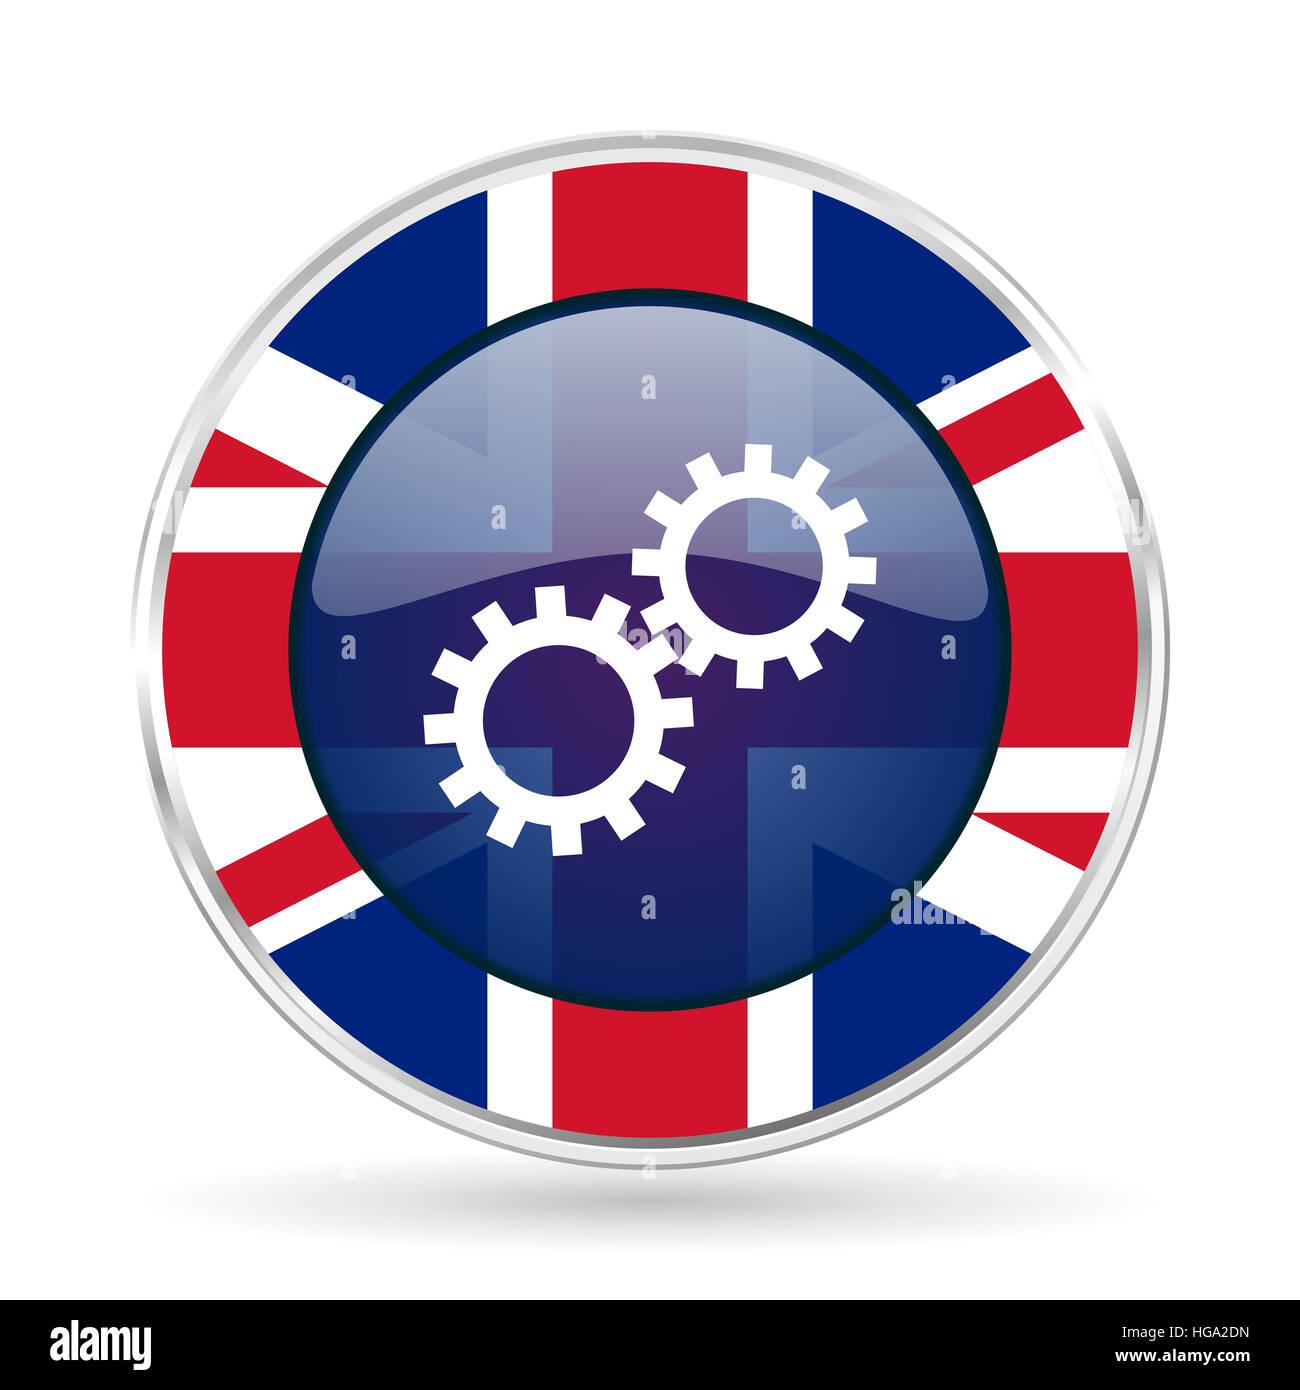 Gear british design icon - round silver metallic border button with Great Britain flag - Stock Image